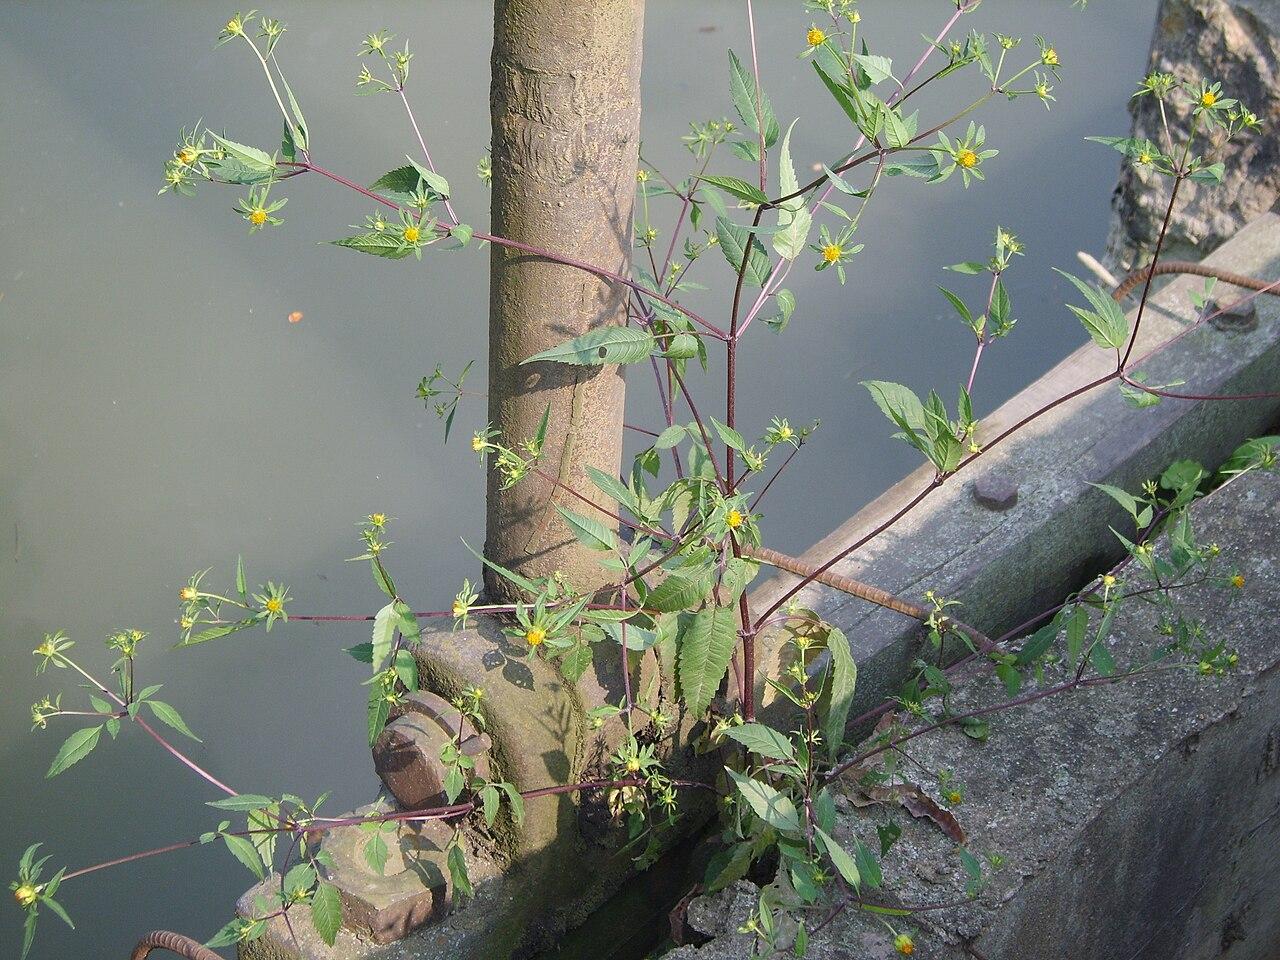 Dvojzub listnatý (Bidens frondosa)